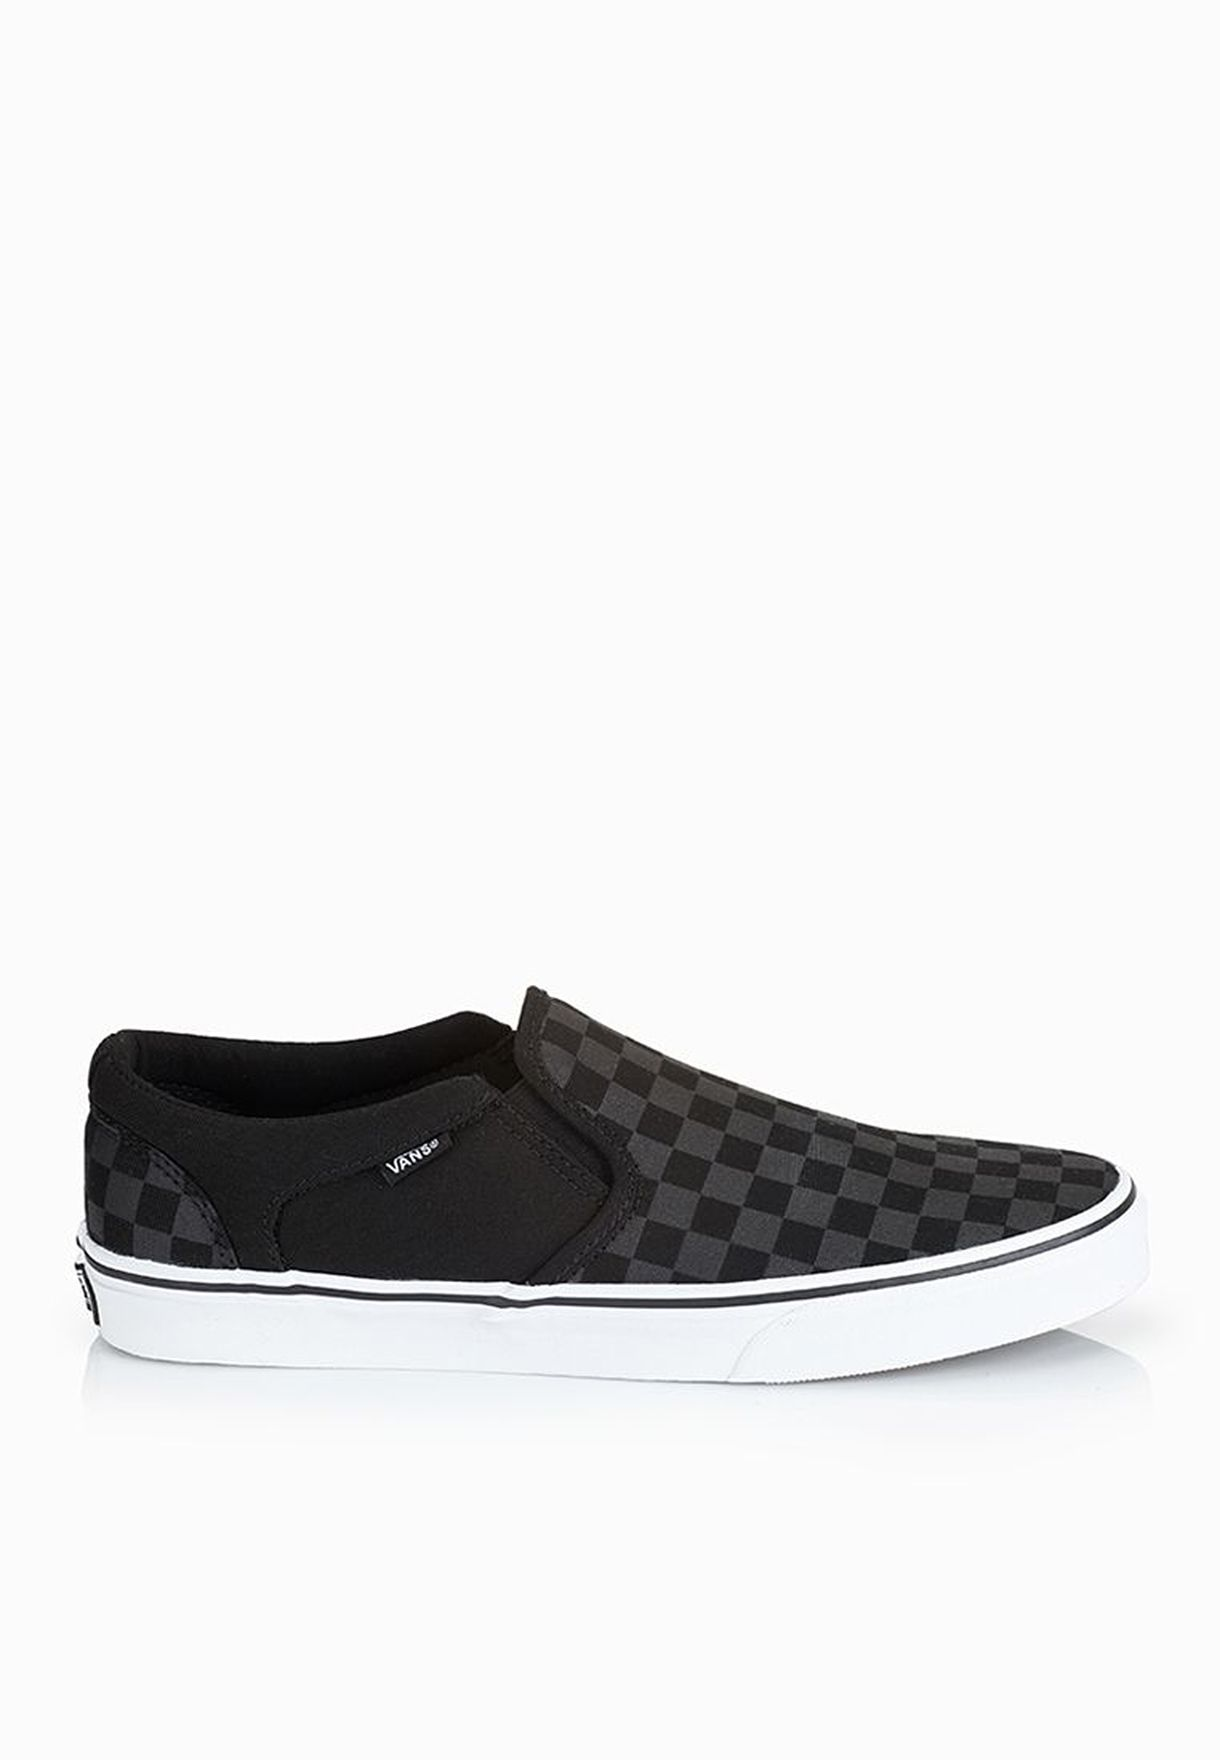 1d9edf3d518d84 Shop Vans black Asher Checkerboard Slip ons SEQ542 for Men in Oman -  VA088SH11AVK